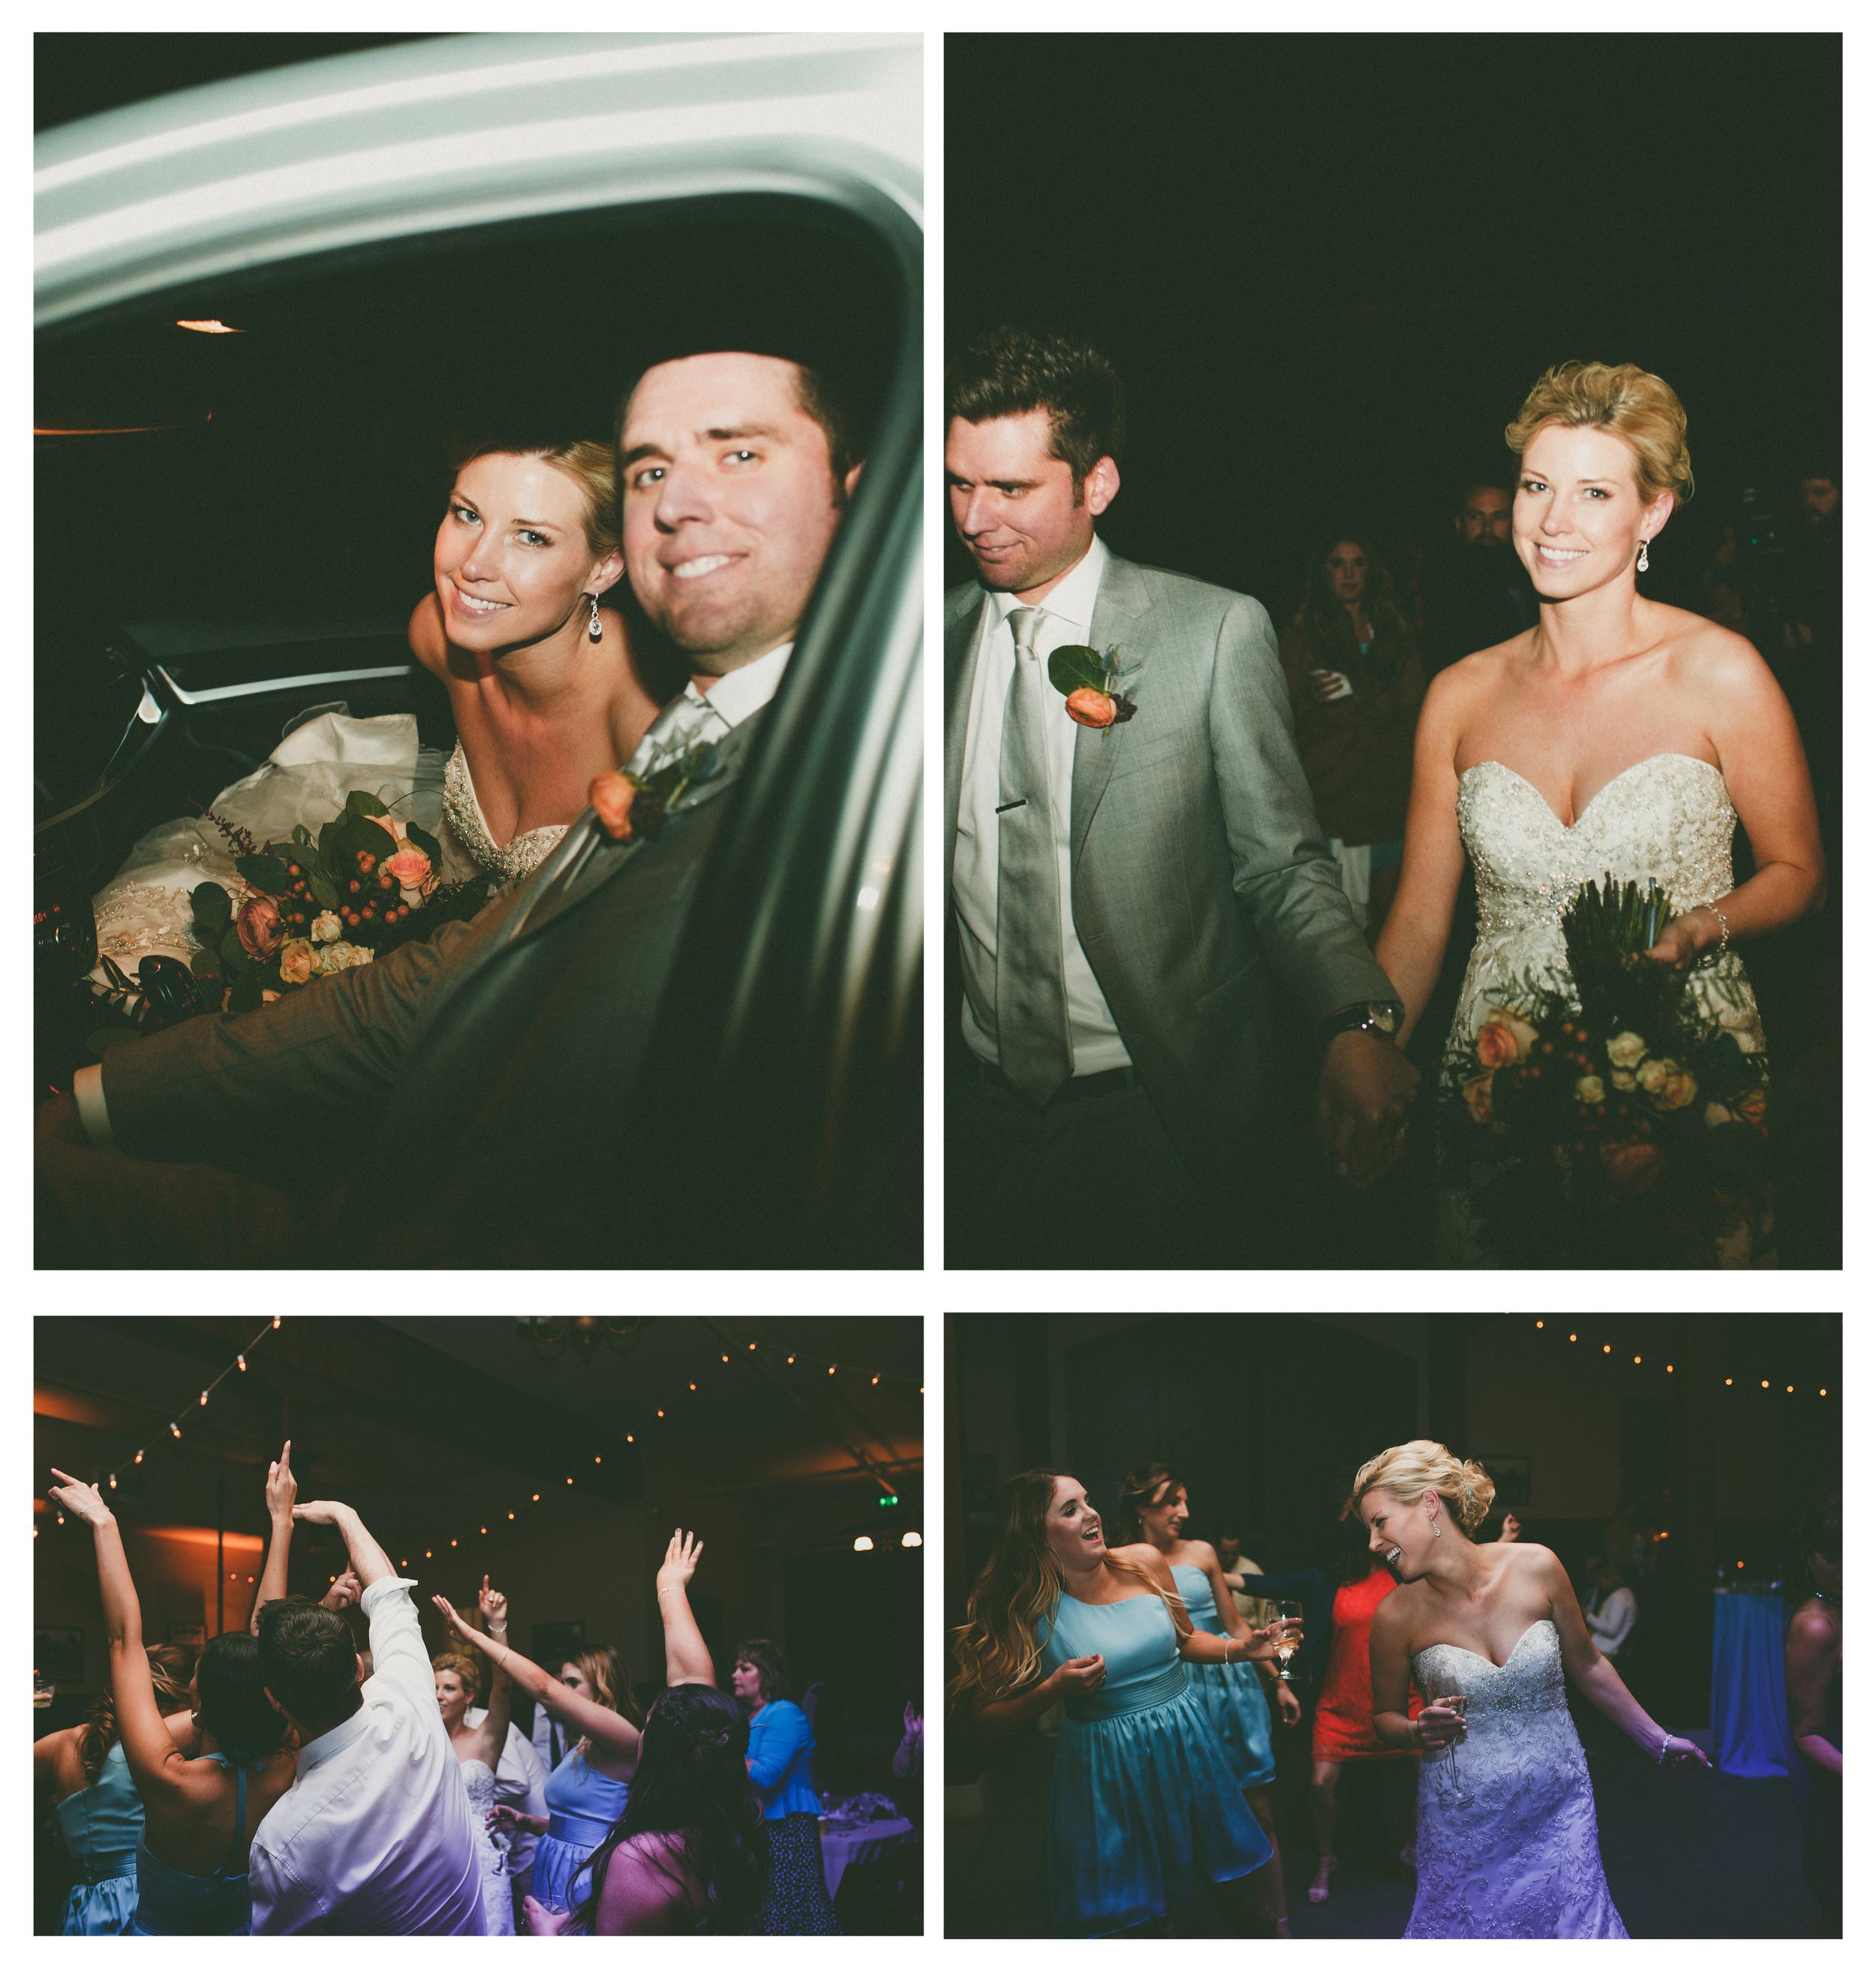 Josh+Andrea22.jpg